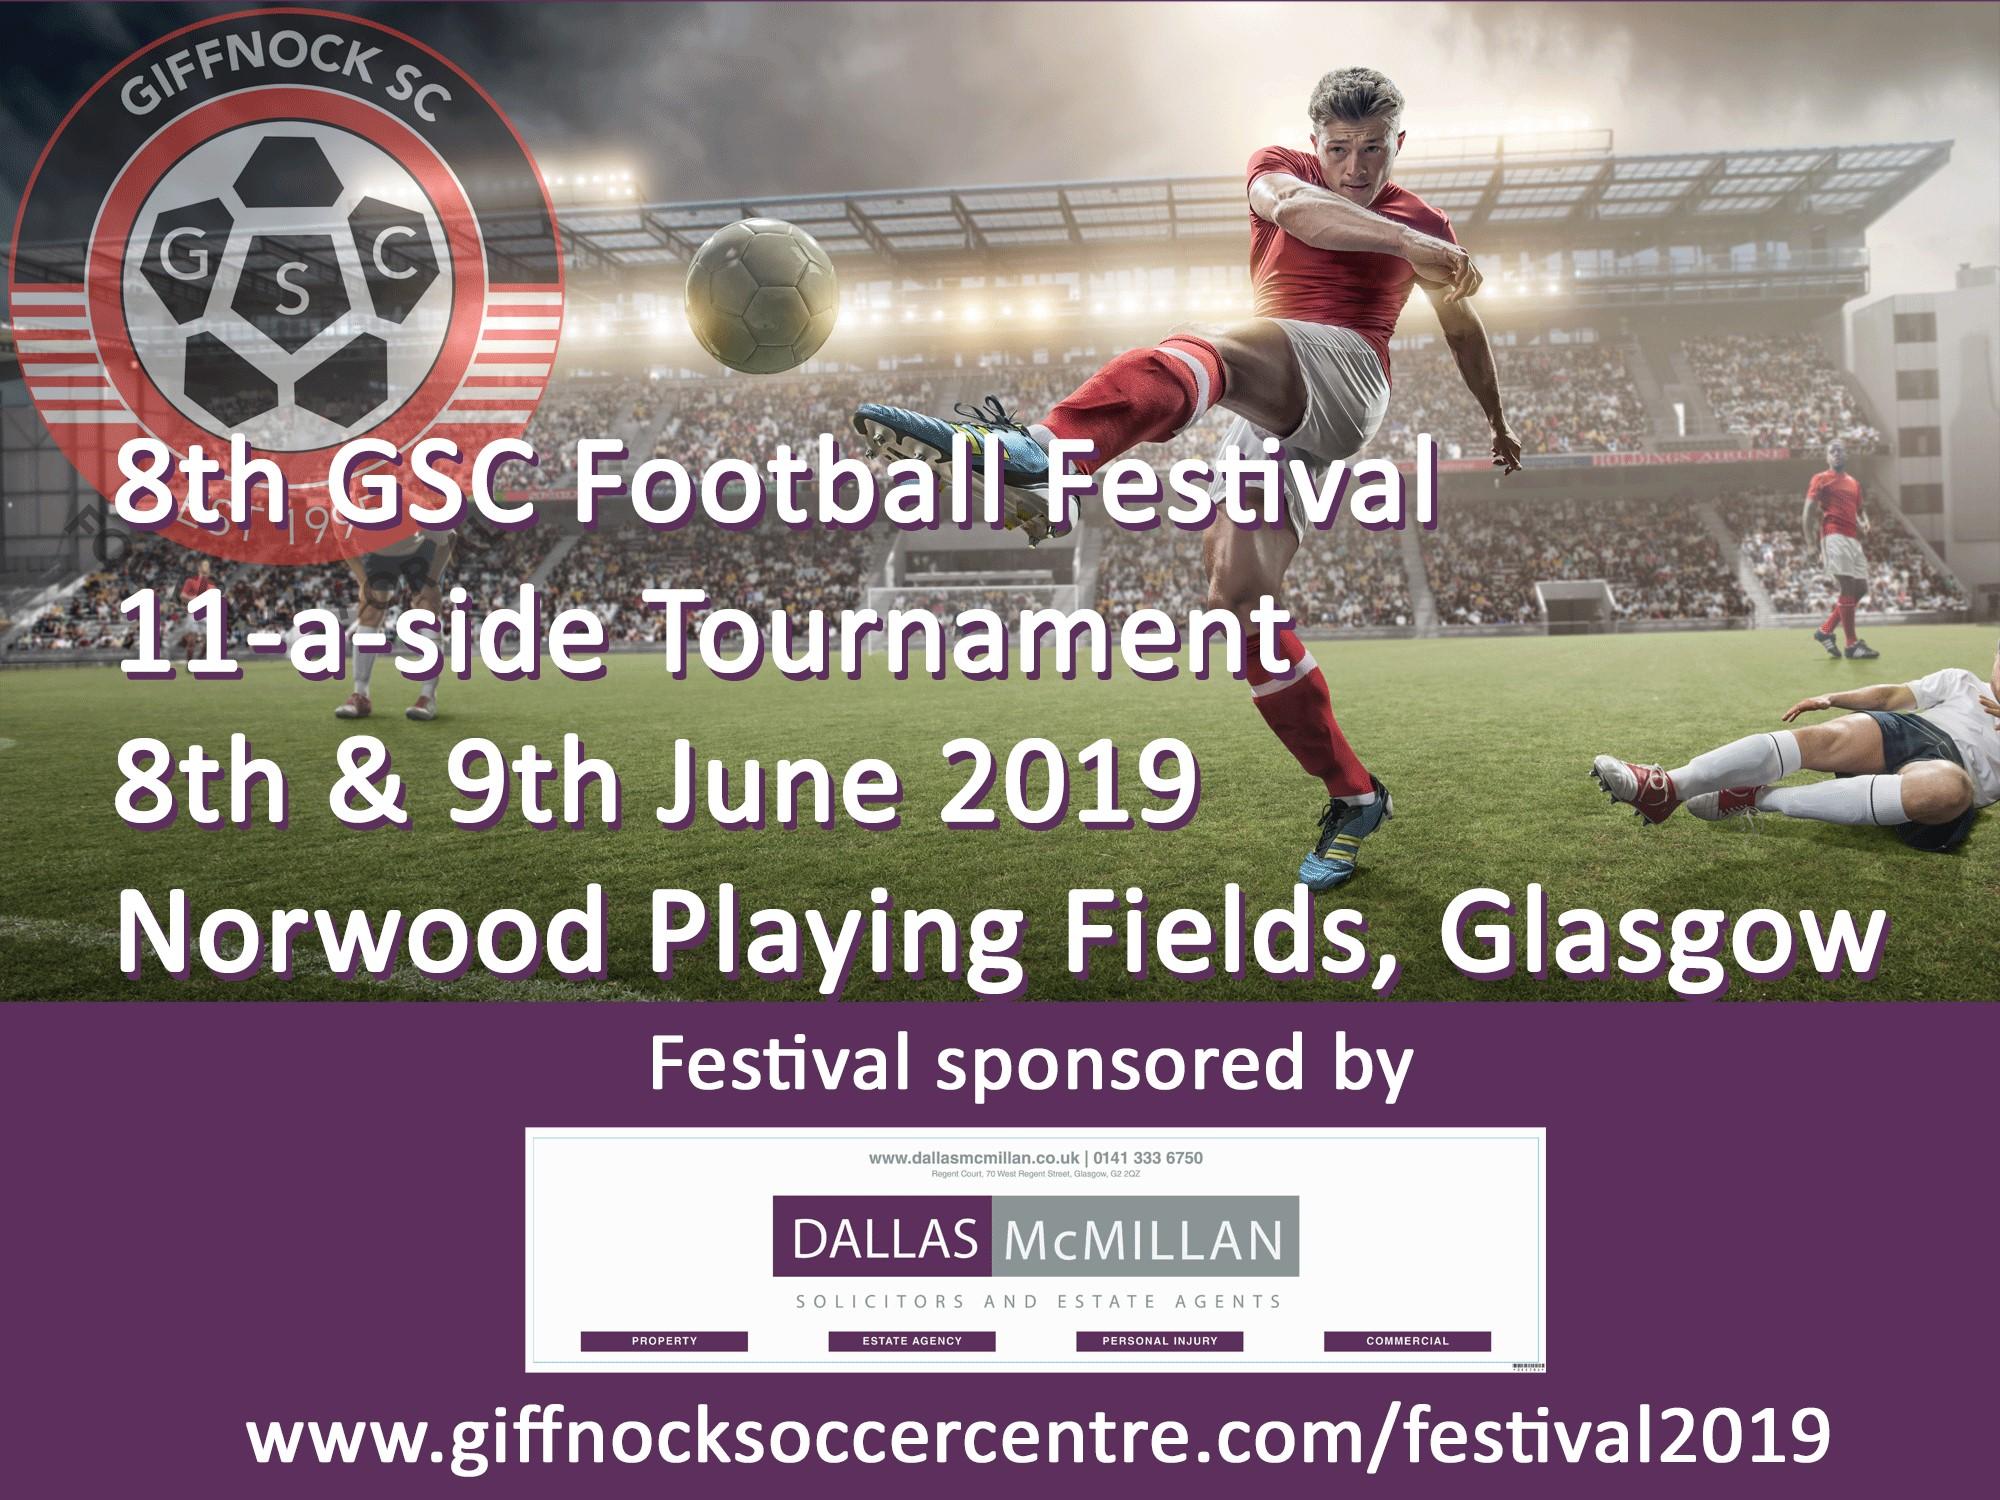 DALLAS McMILLAN SPONSOR GIFFNOCK SOCCER CENTRE'S FOOTBALL FESTIVAL 2019